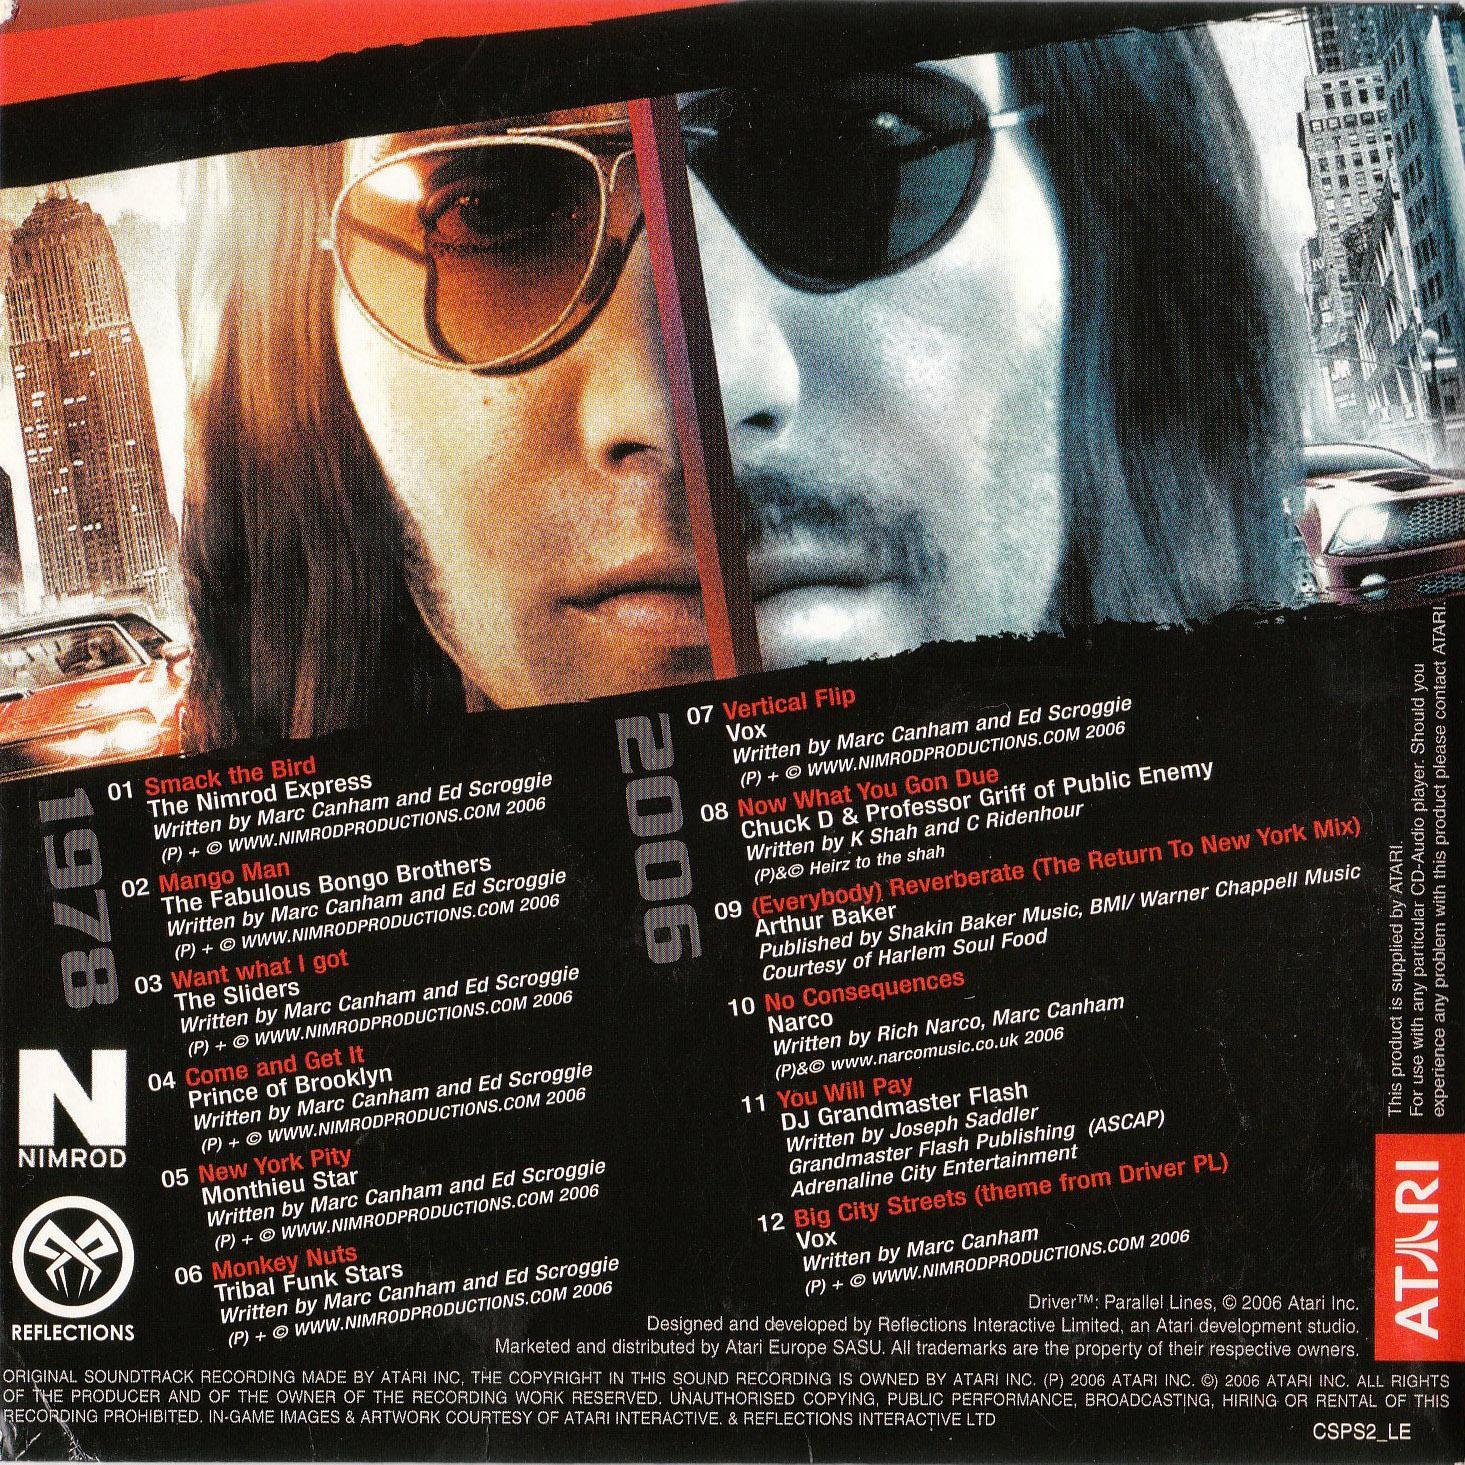 Driver Parallel Lines Soundtrack